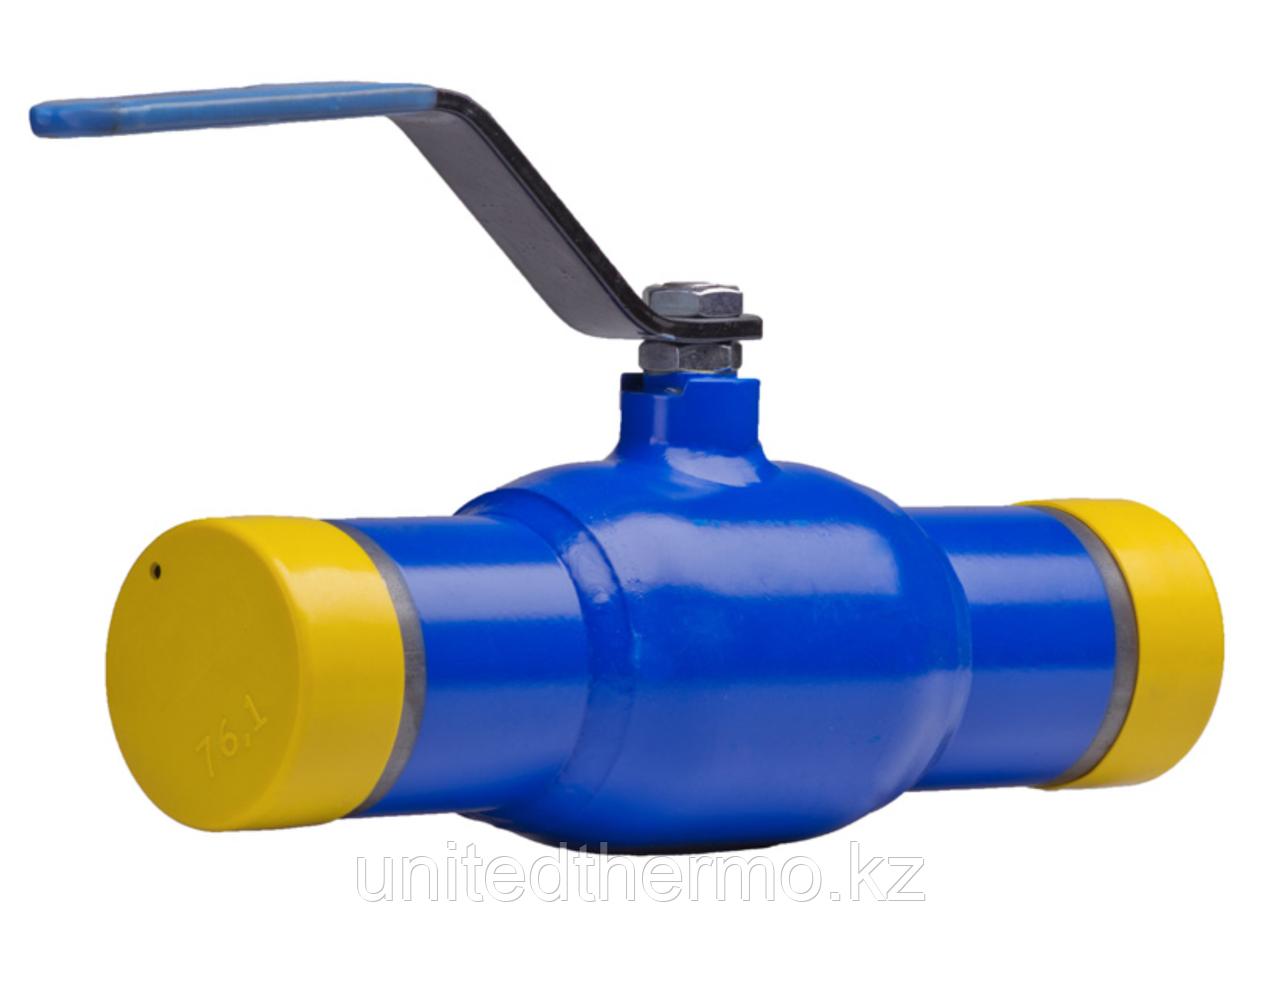 Кран сварной 20 мм EFAR